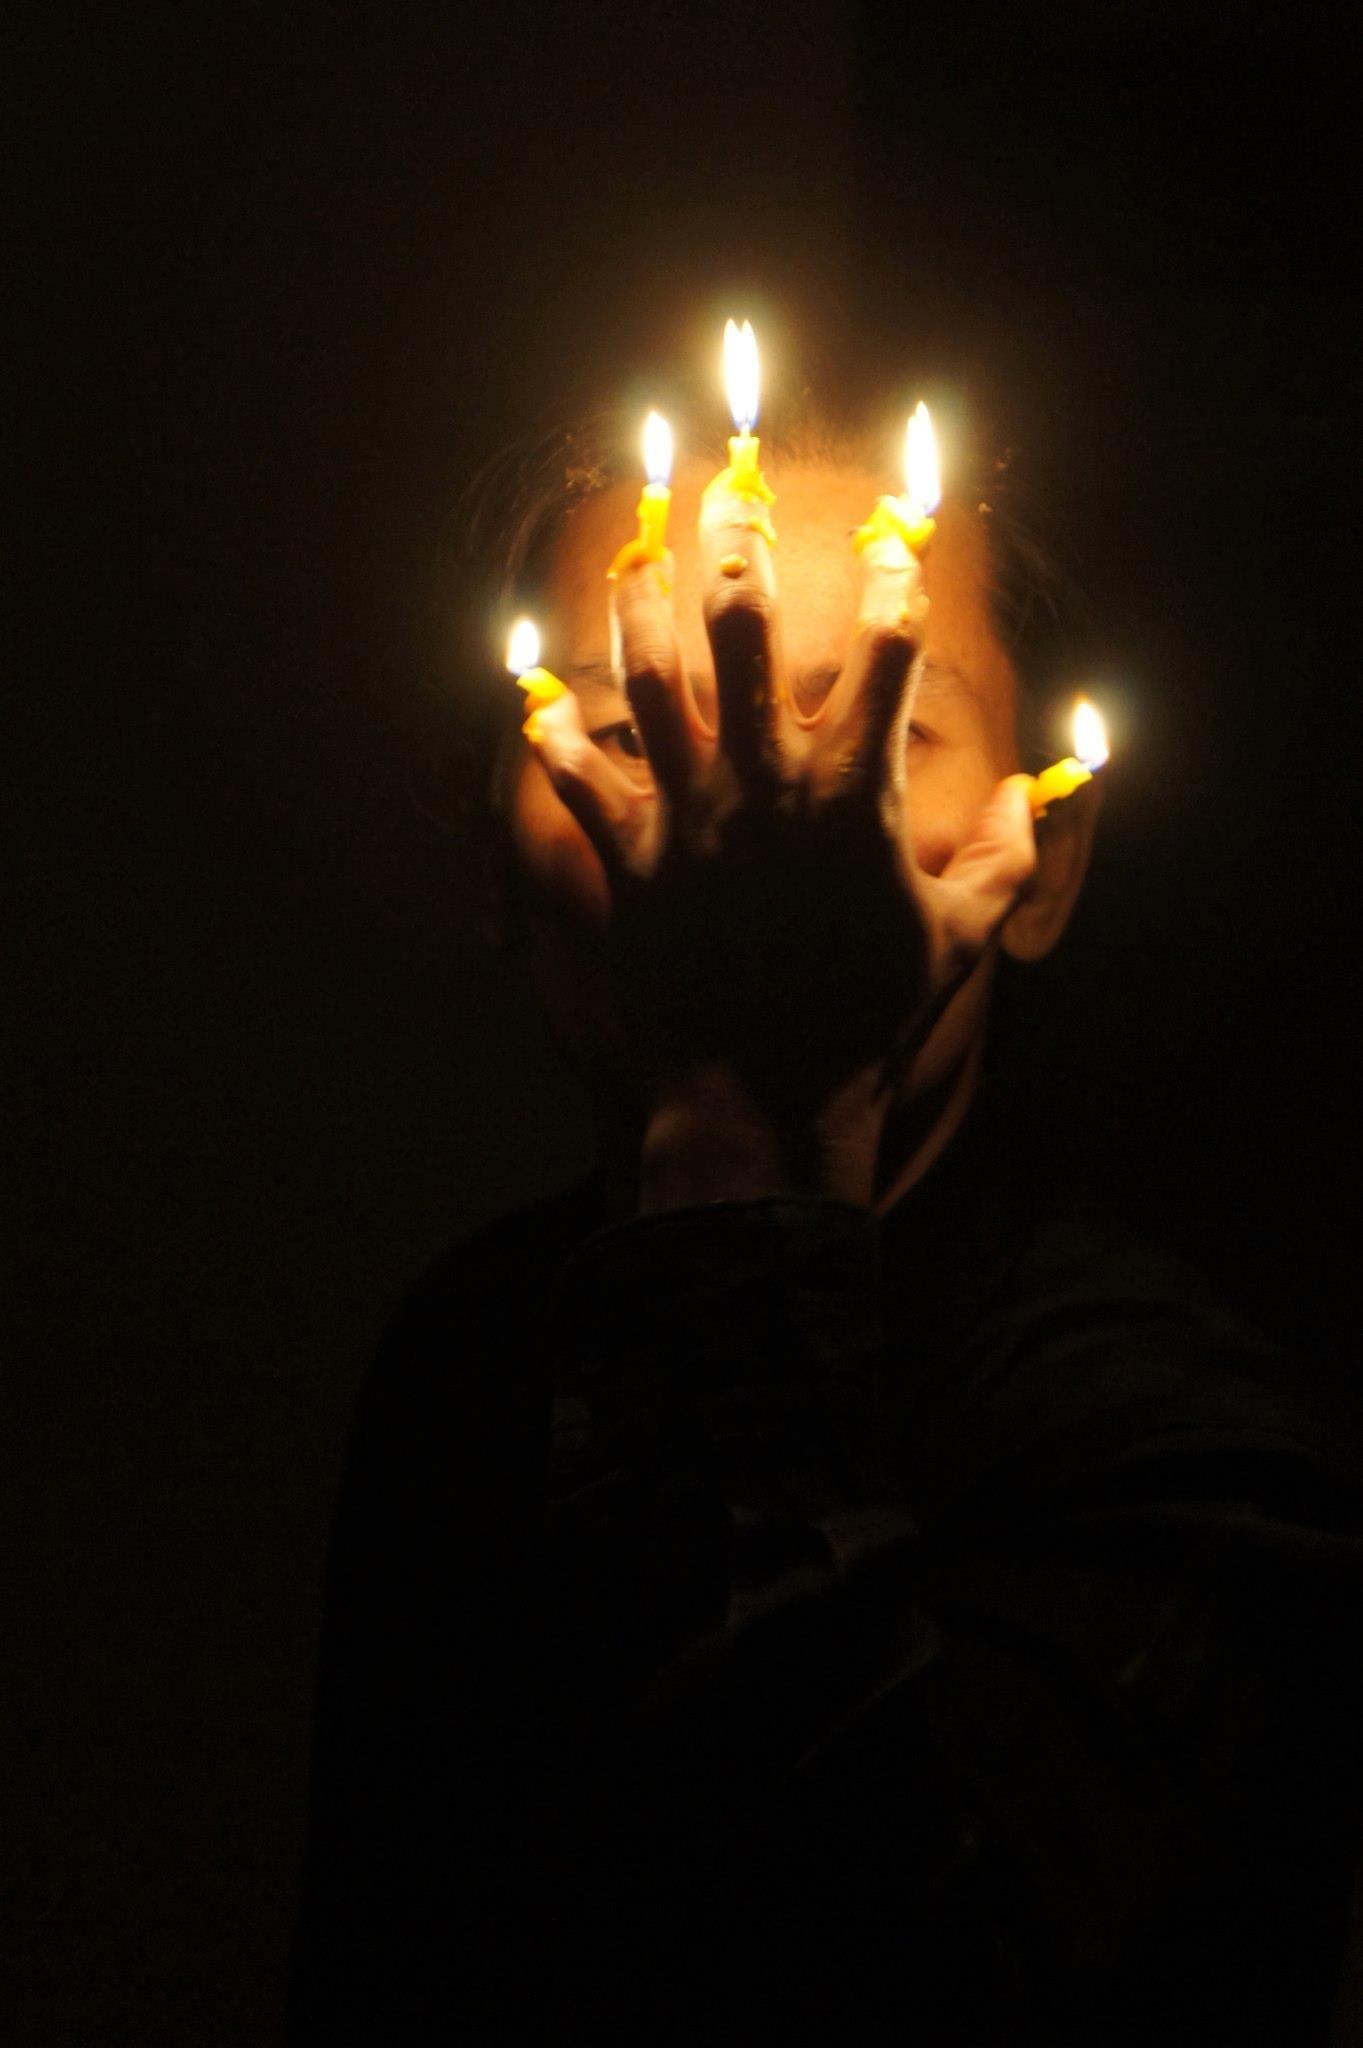 Jason Lim, Duet (Light) I and II (2012), live durational performancesand photographic exhibitionNature/Portrait/Study at the VENICE INTERNATIONAL PERFORMANCE ART WEEK 2012.Image © Daniela Beltrani.